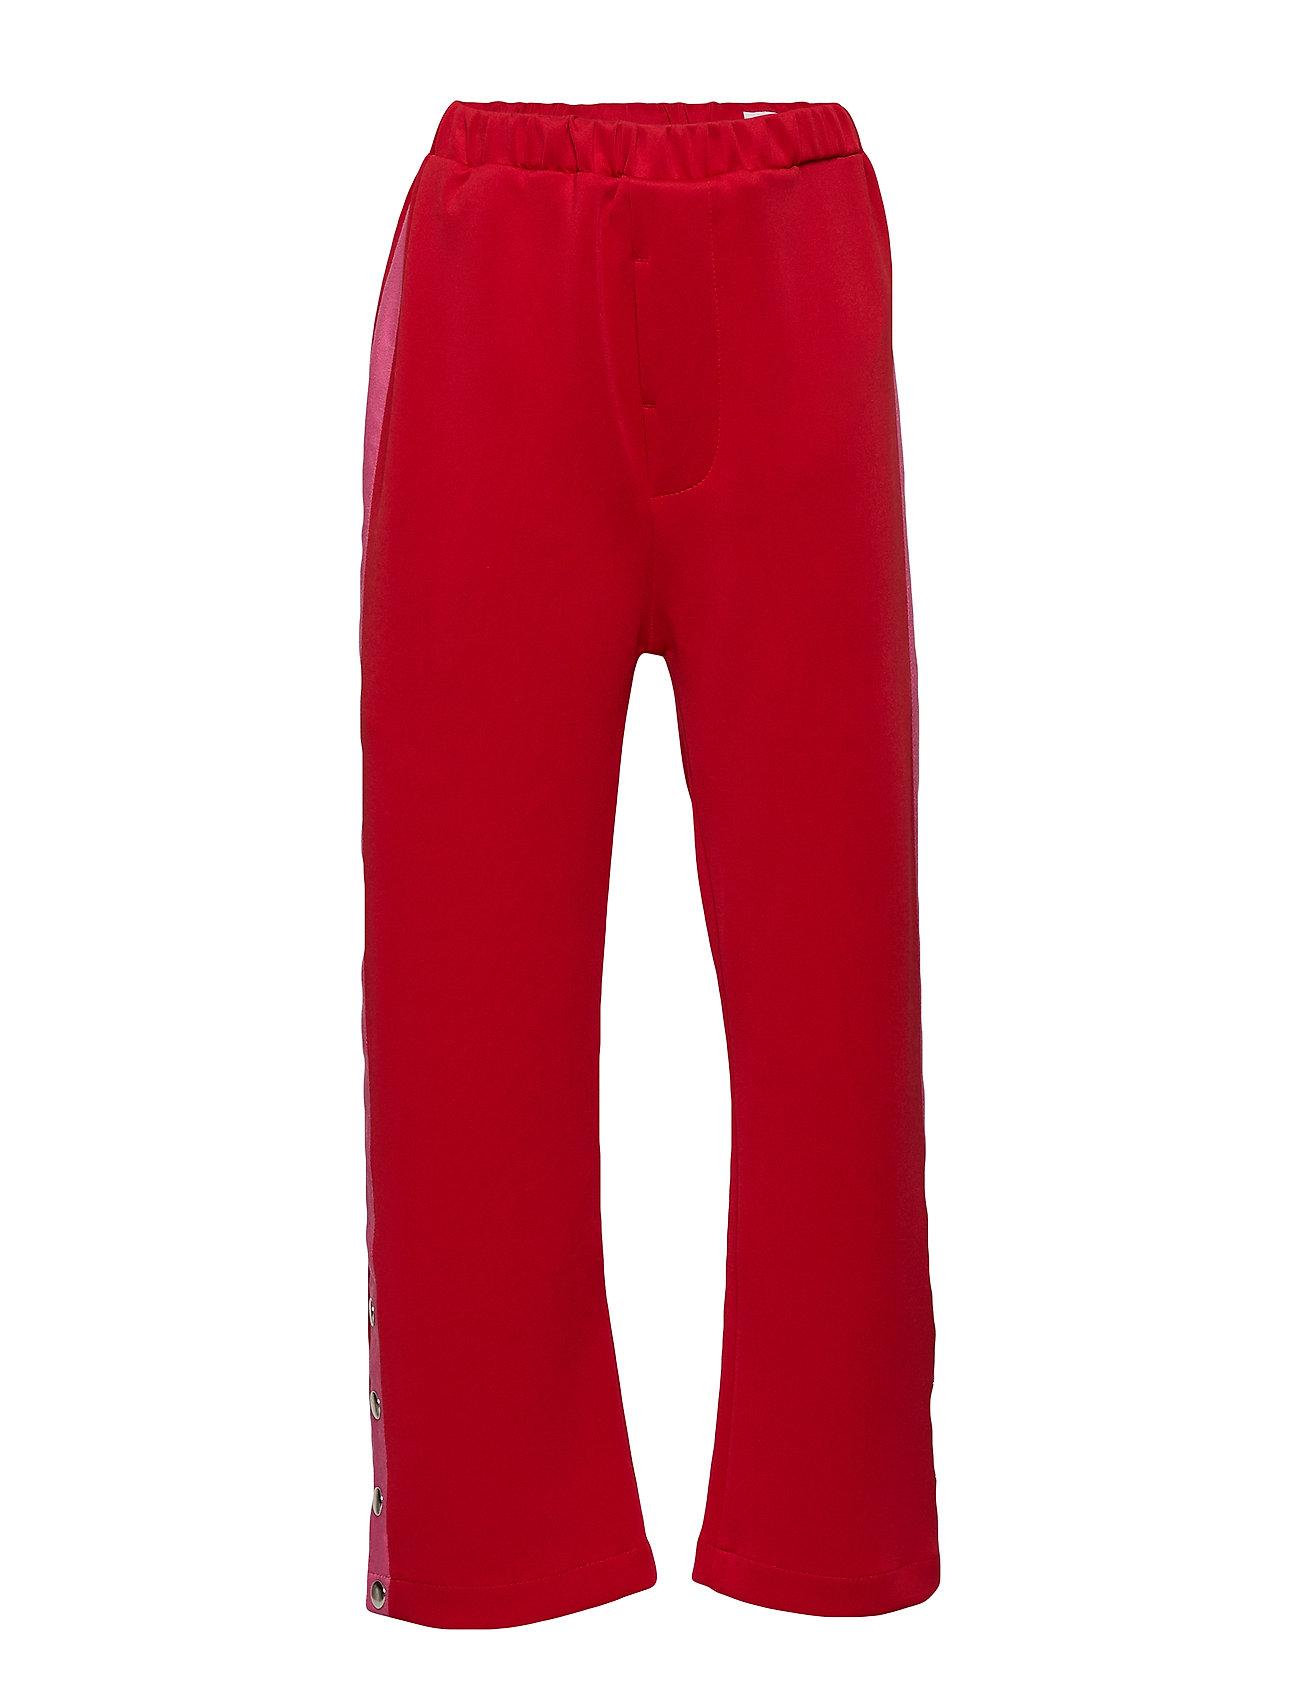 Christina Rohde Pants No. 327 - RED